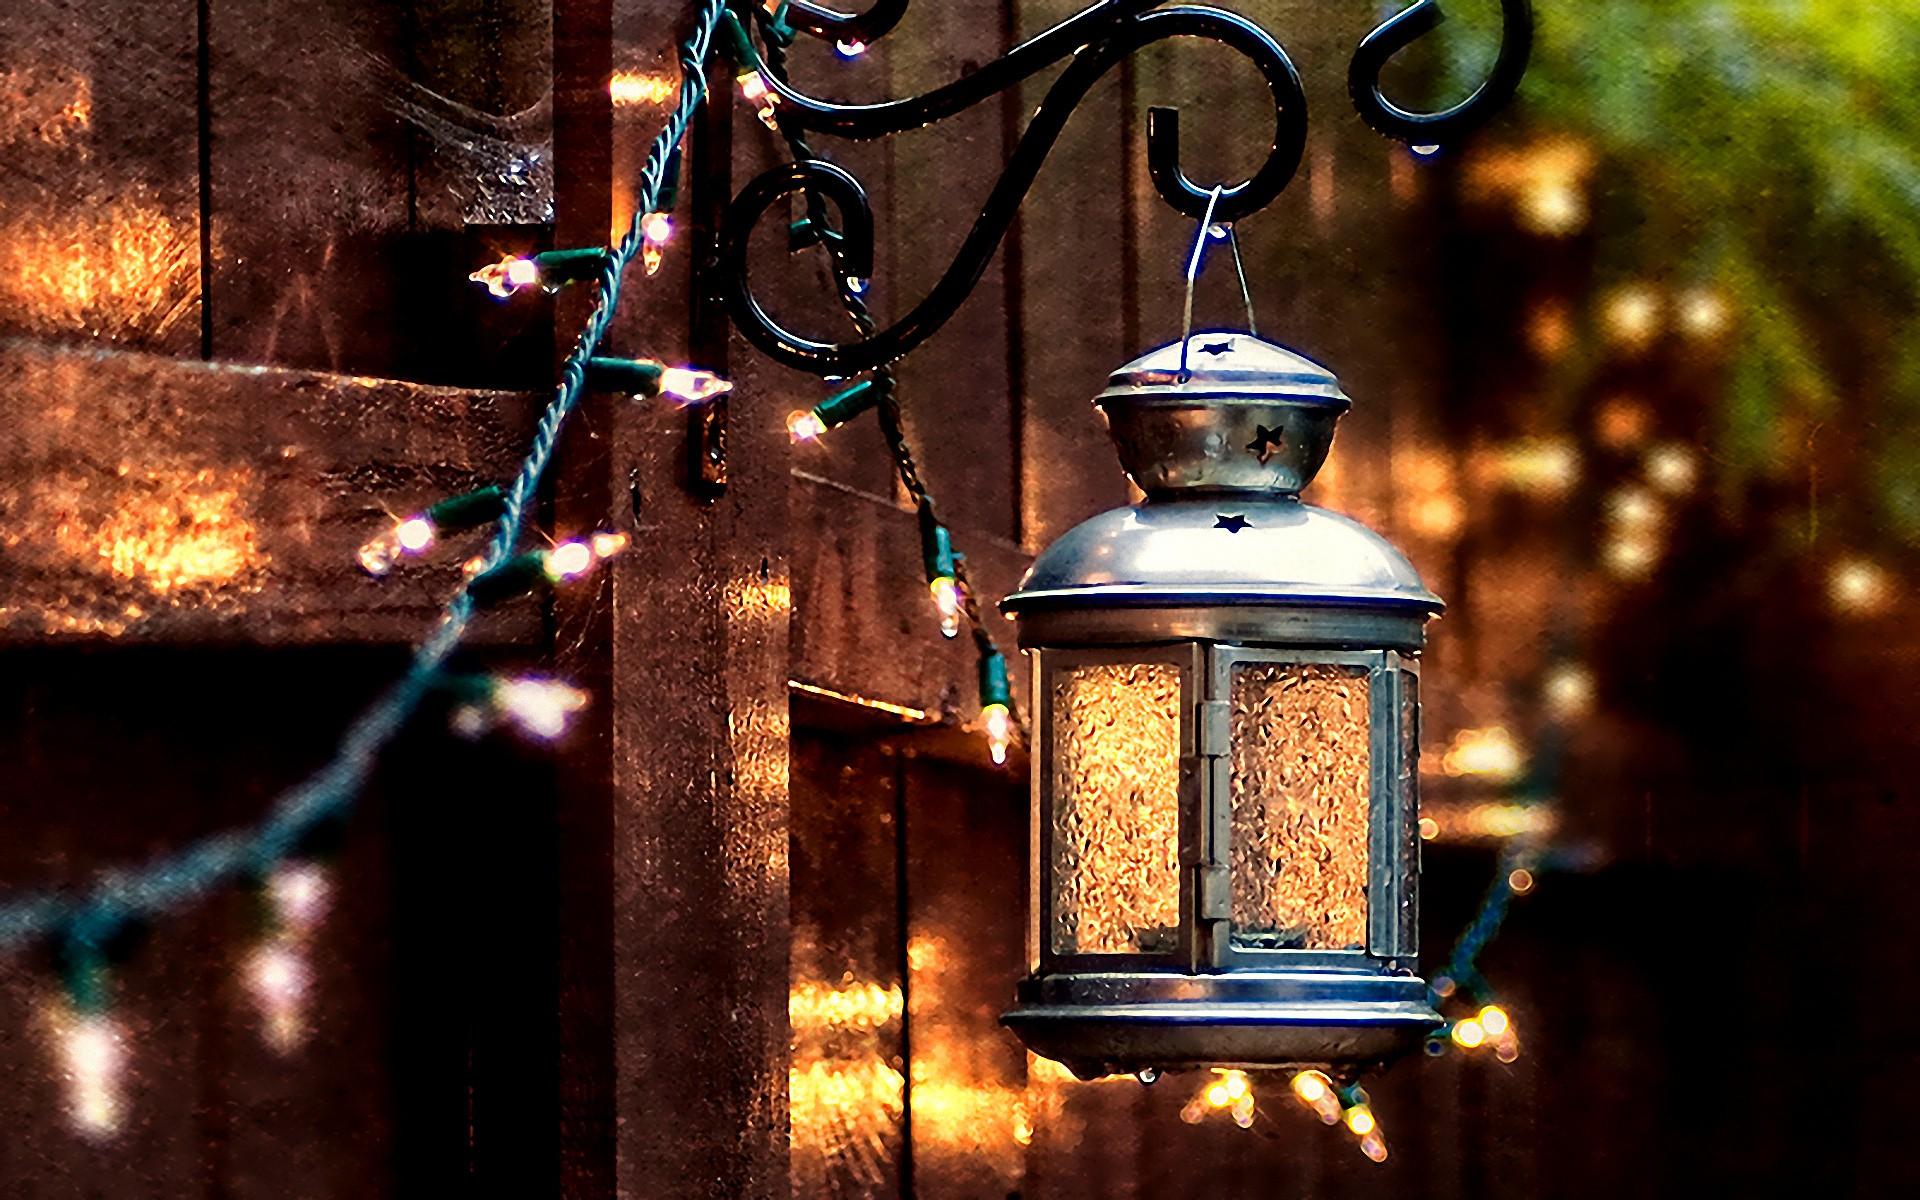 Bokeh Lights Lamp Fence Wallpaper 1920x1200 37396